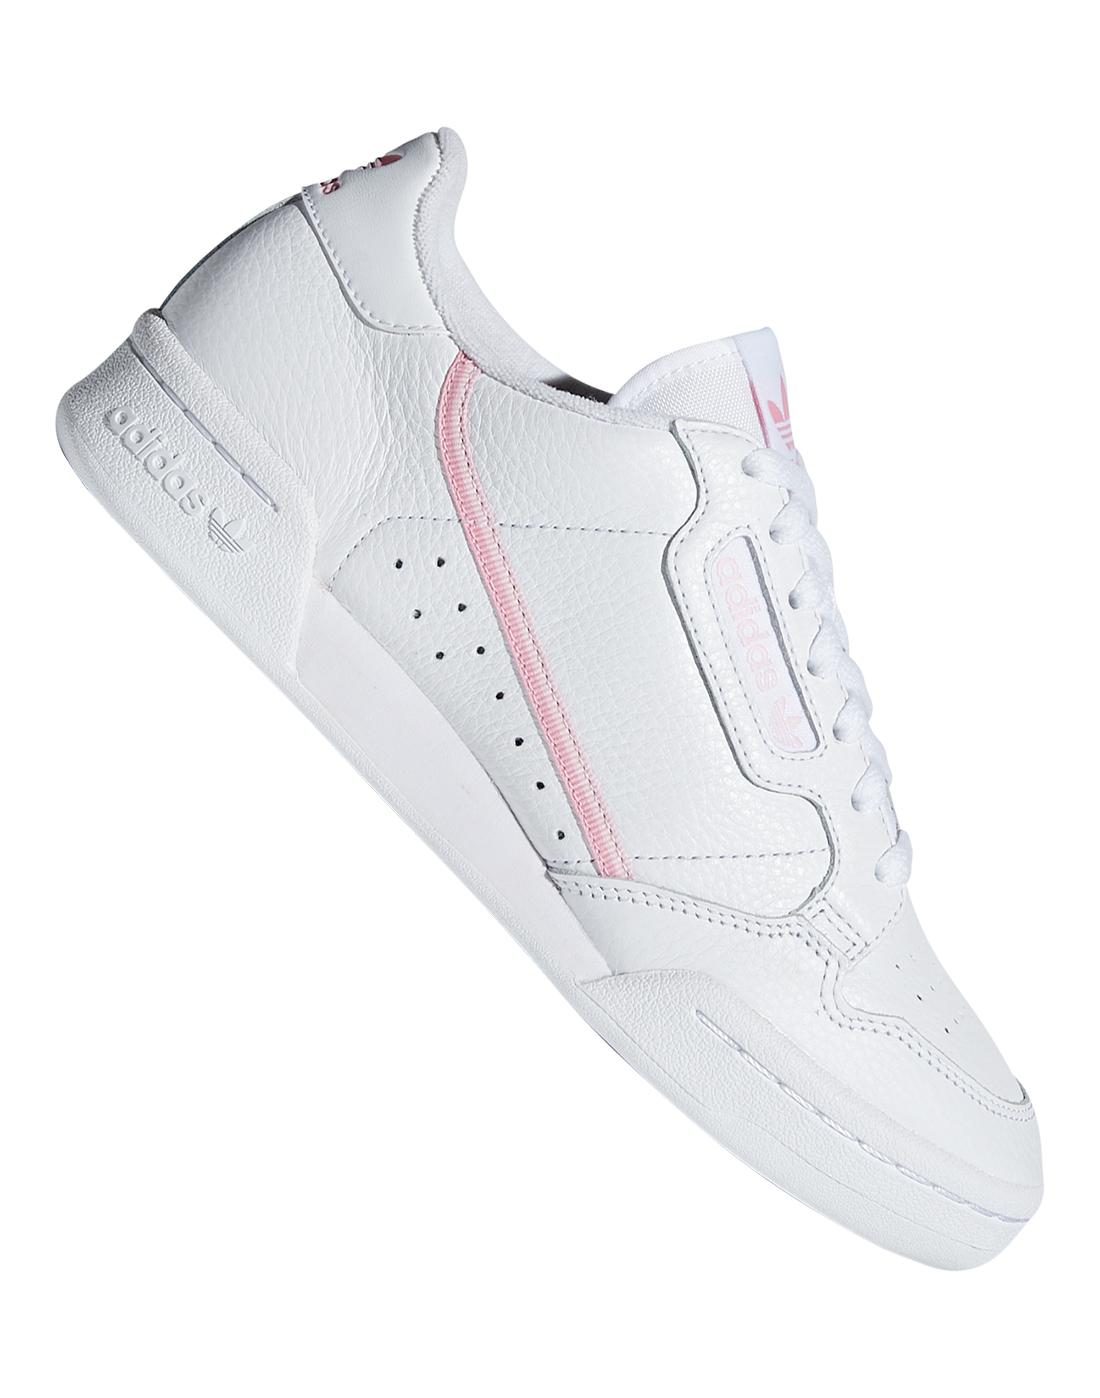 fda14a1750ec9e Women s Pink   White adidas Originals Continental 80